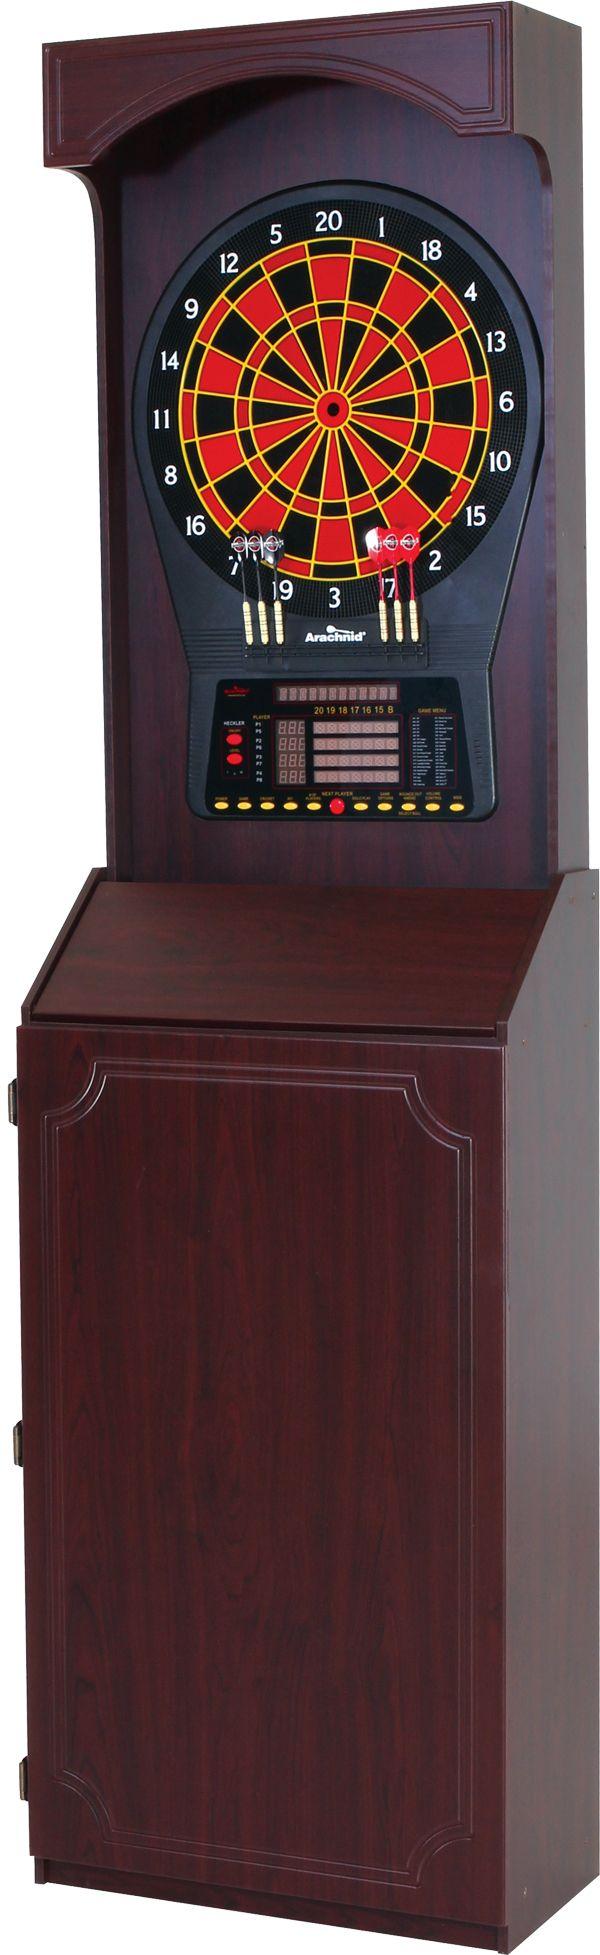 Attirant Arachnid CricketPro 800 Electronic Dartboard Cabinet